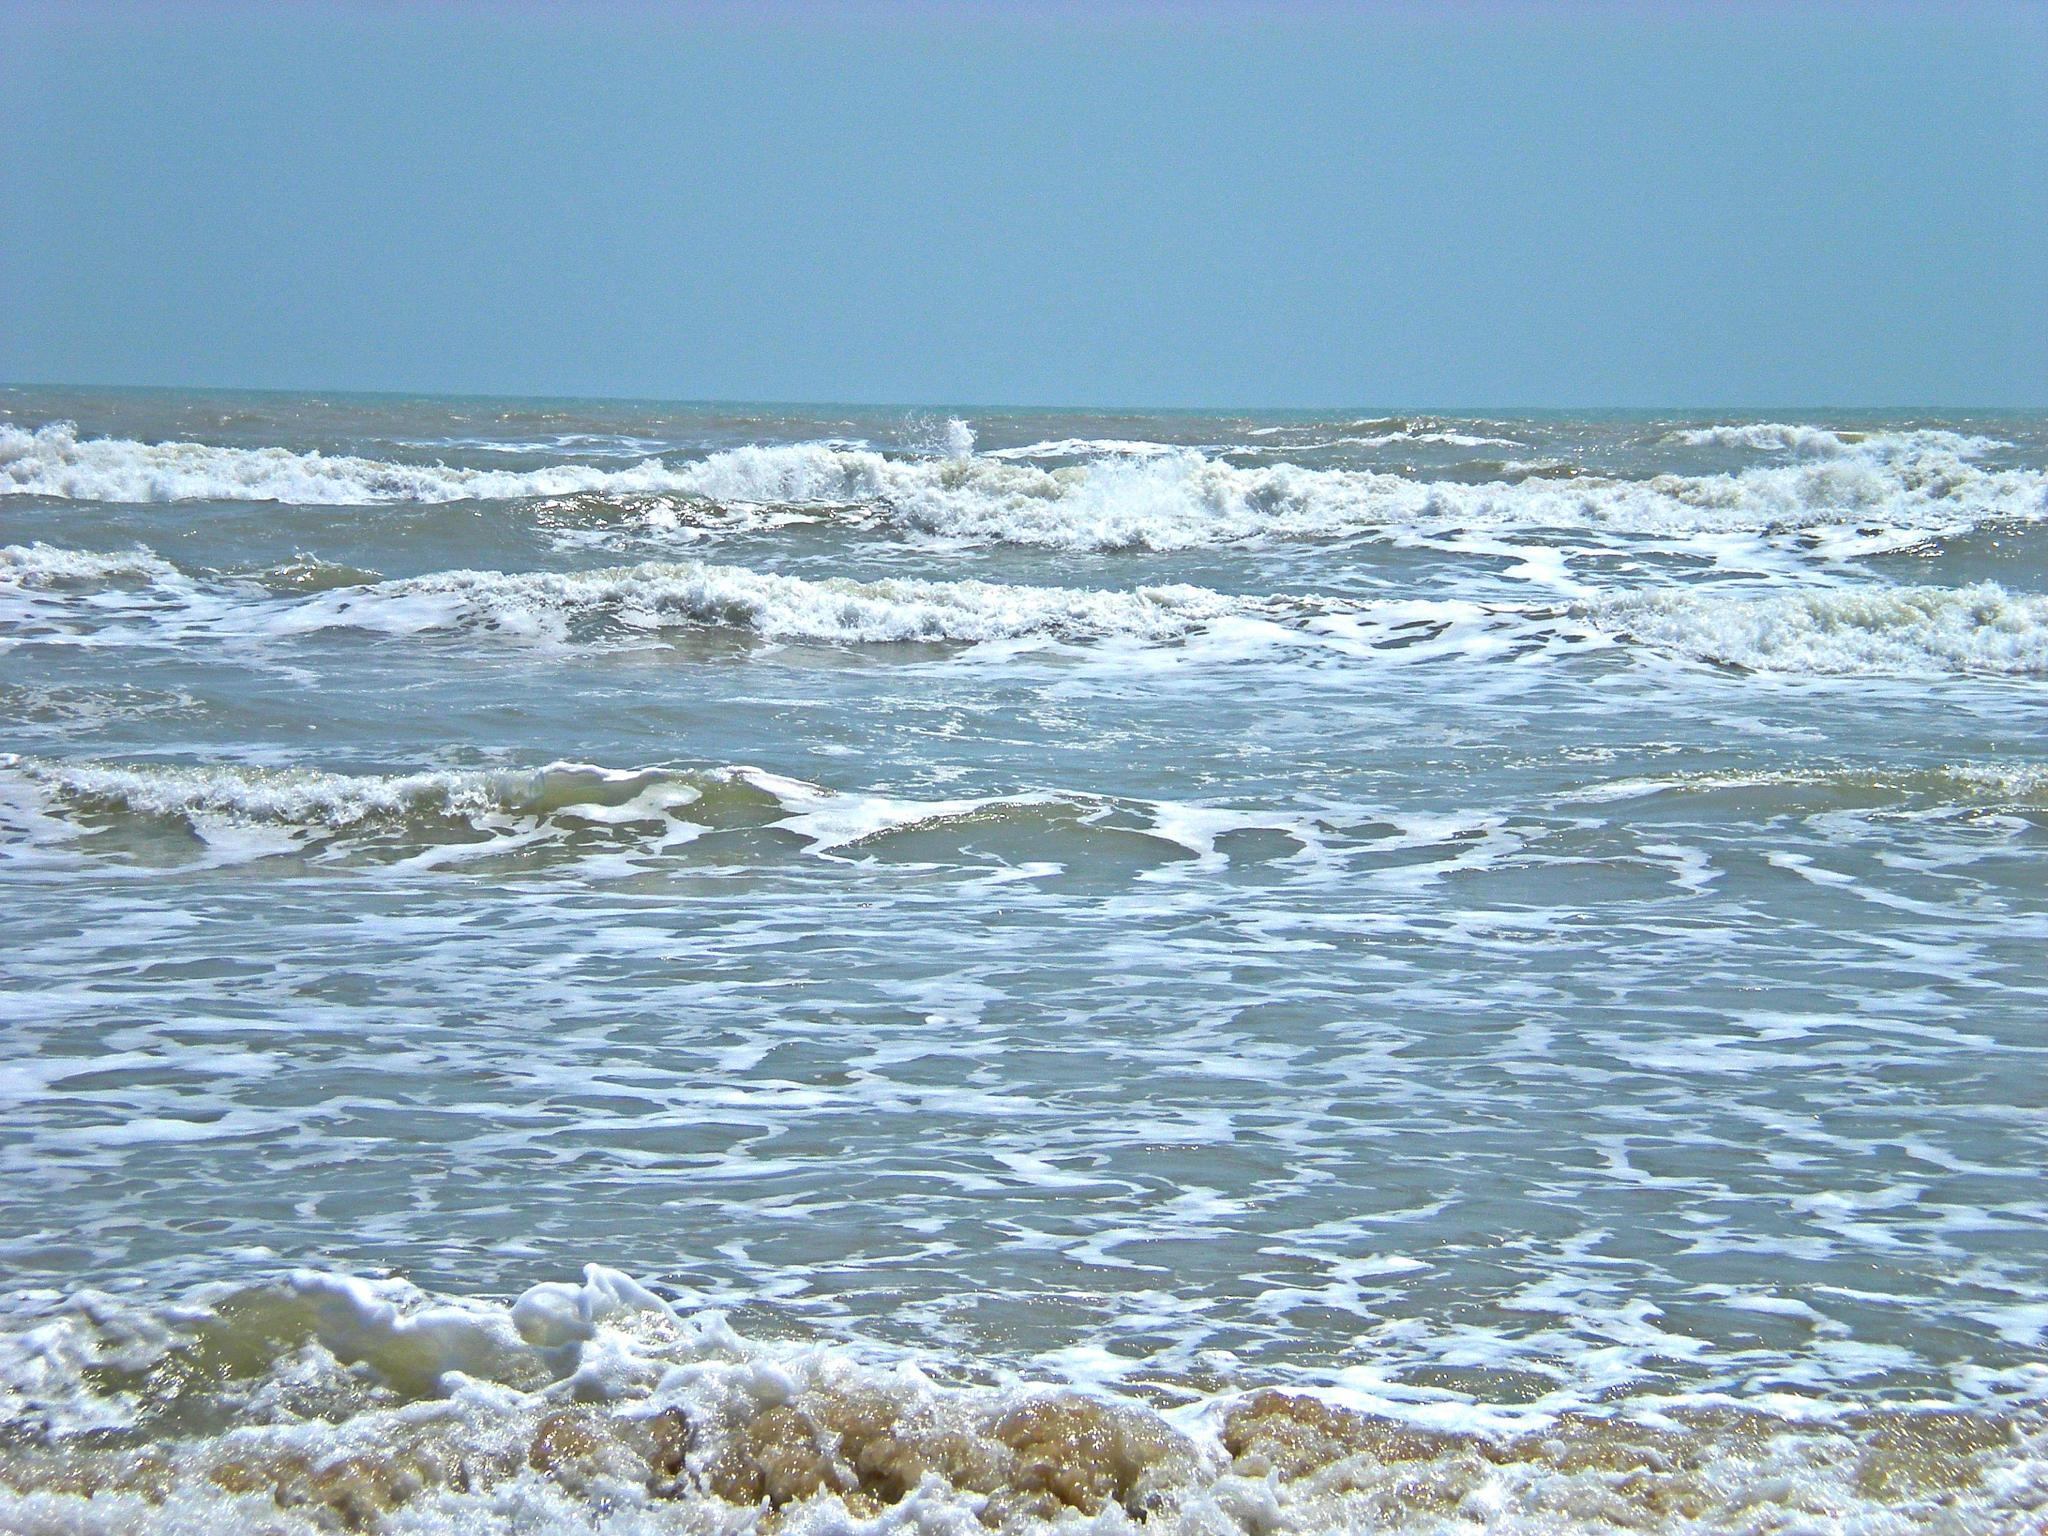 WAVES ANNA MARIE ISLAND FLORIDA by bechcomber444